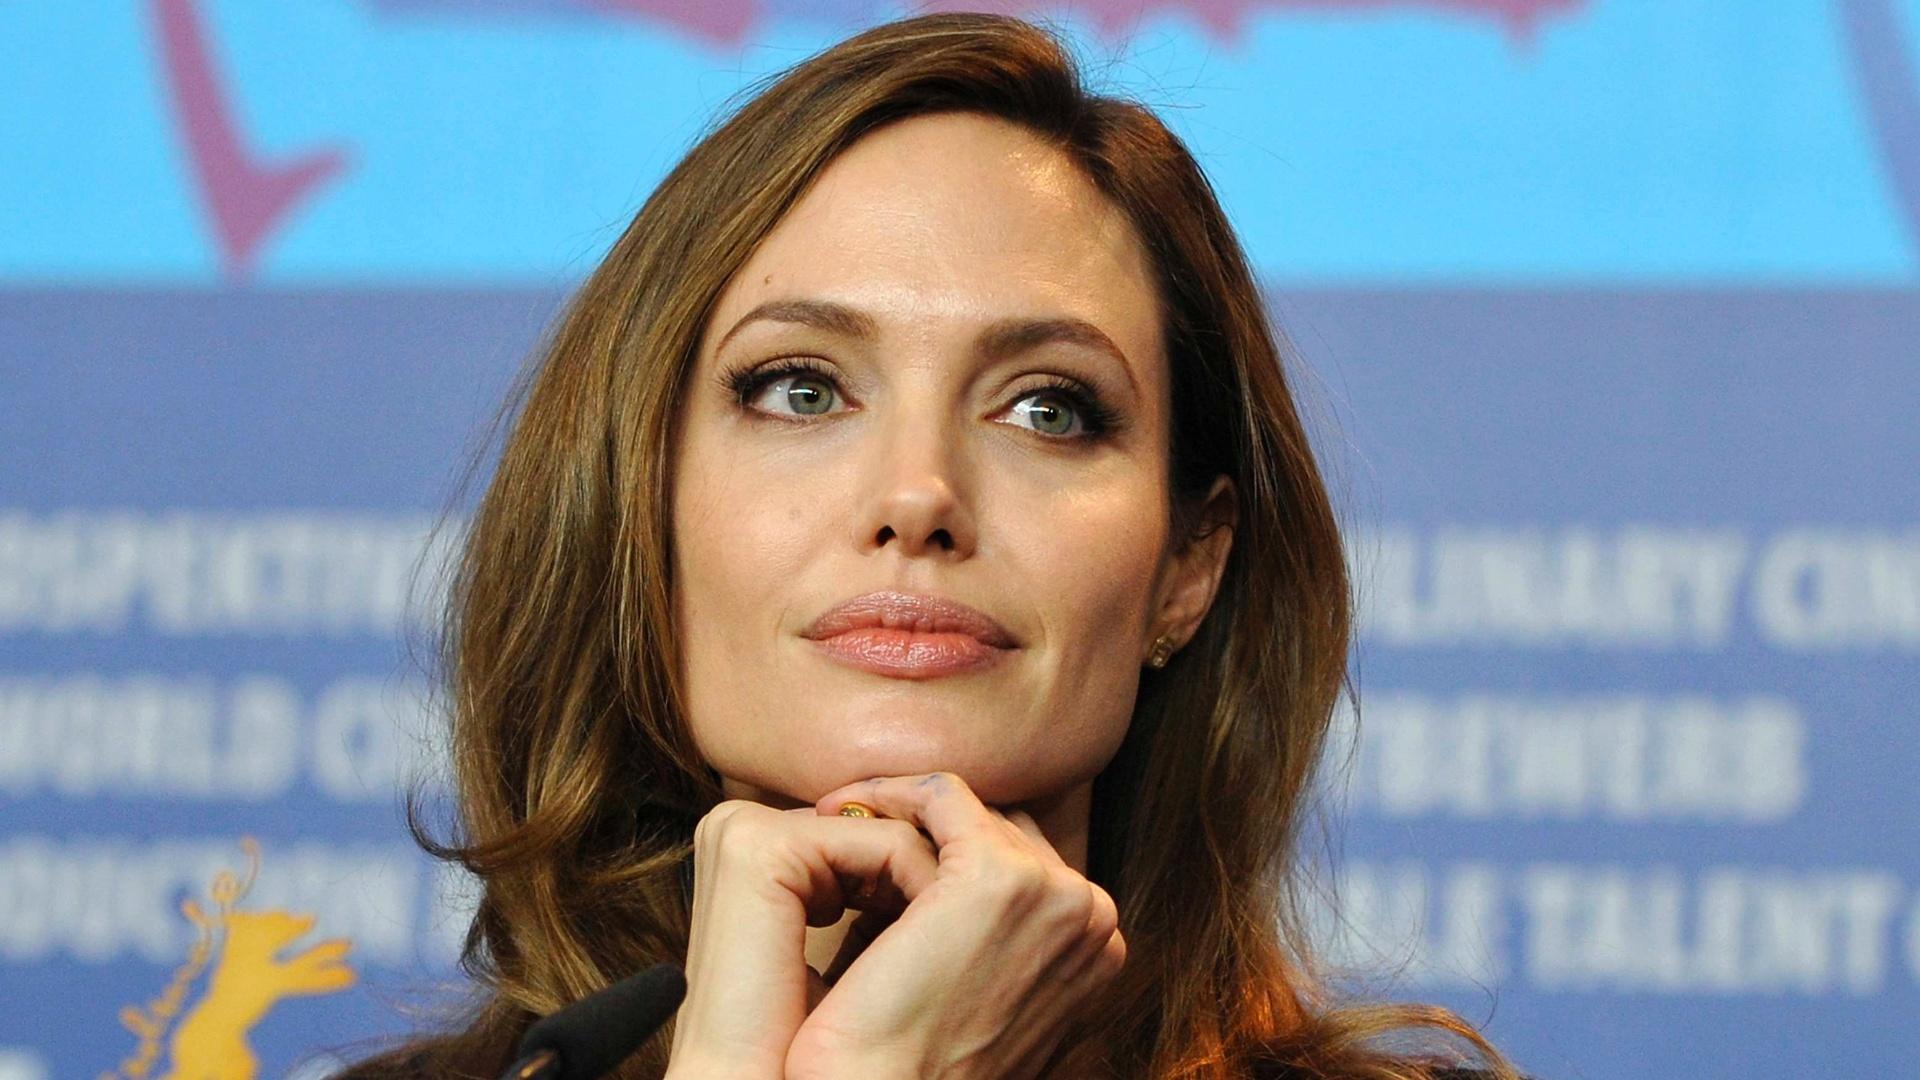 Angelina Jolie durante entrevista coletiva no Festival de Berlim